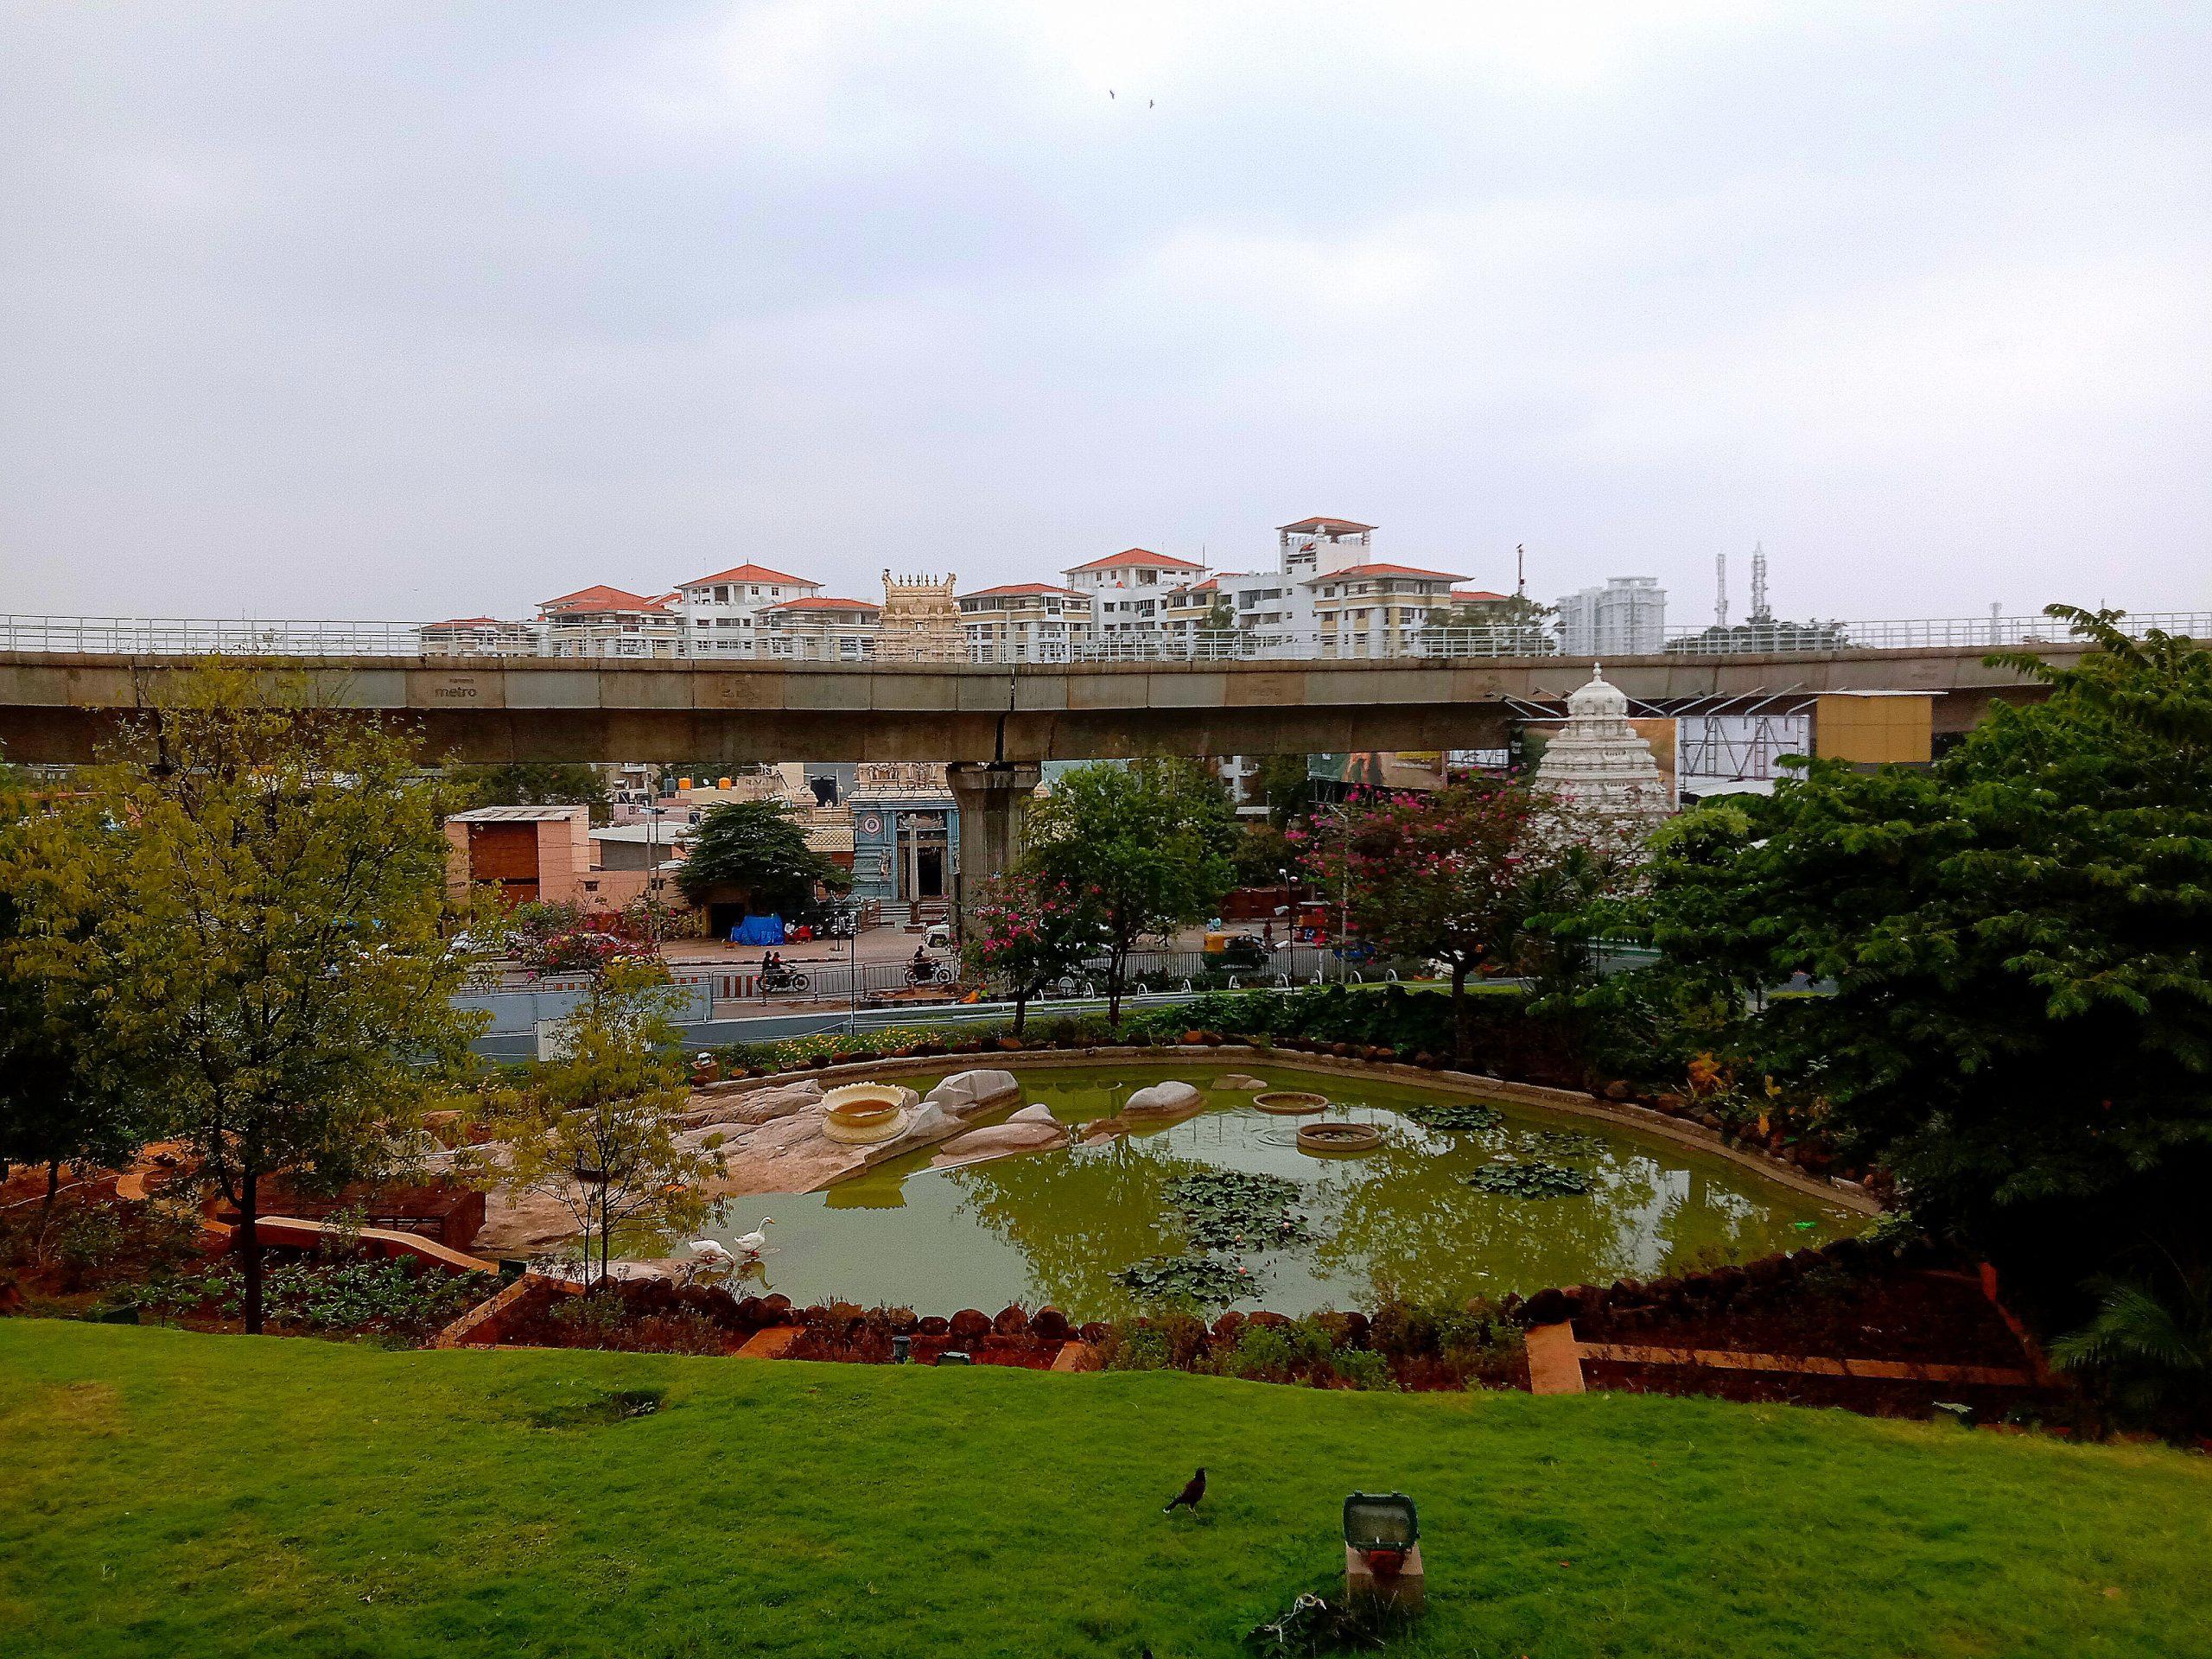 Pool in metro city